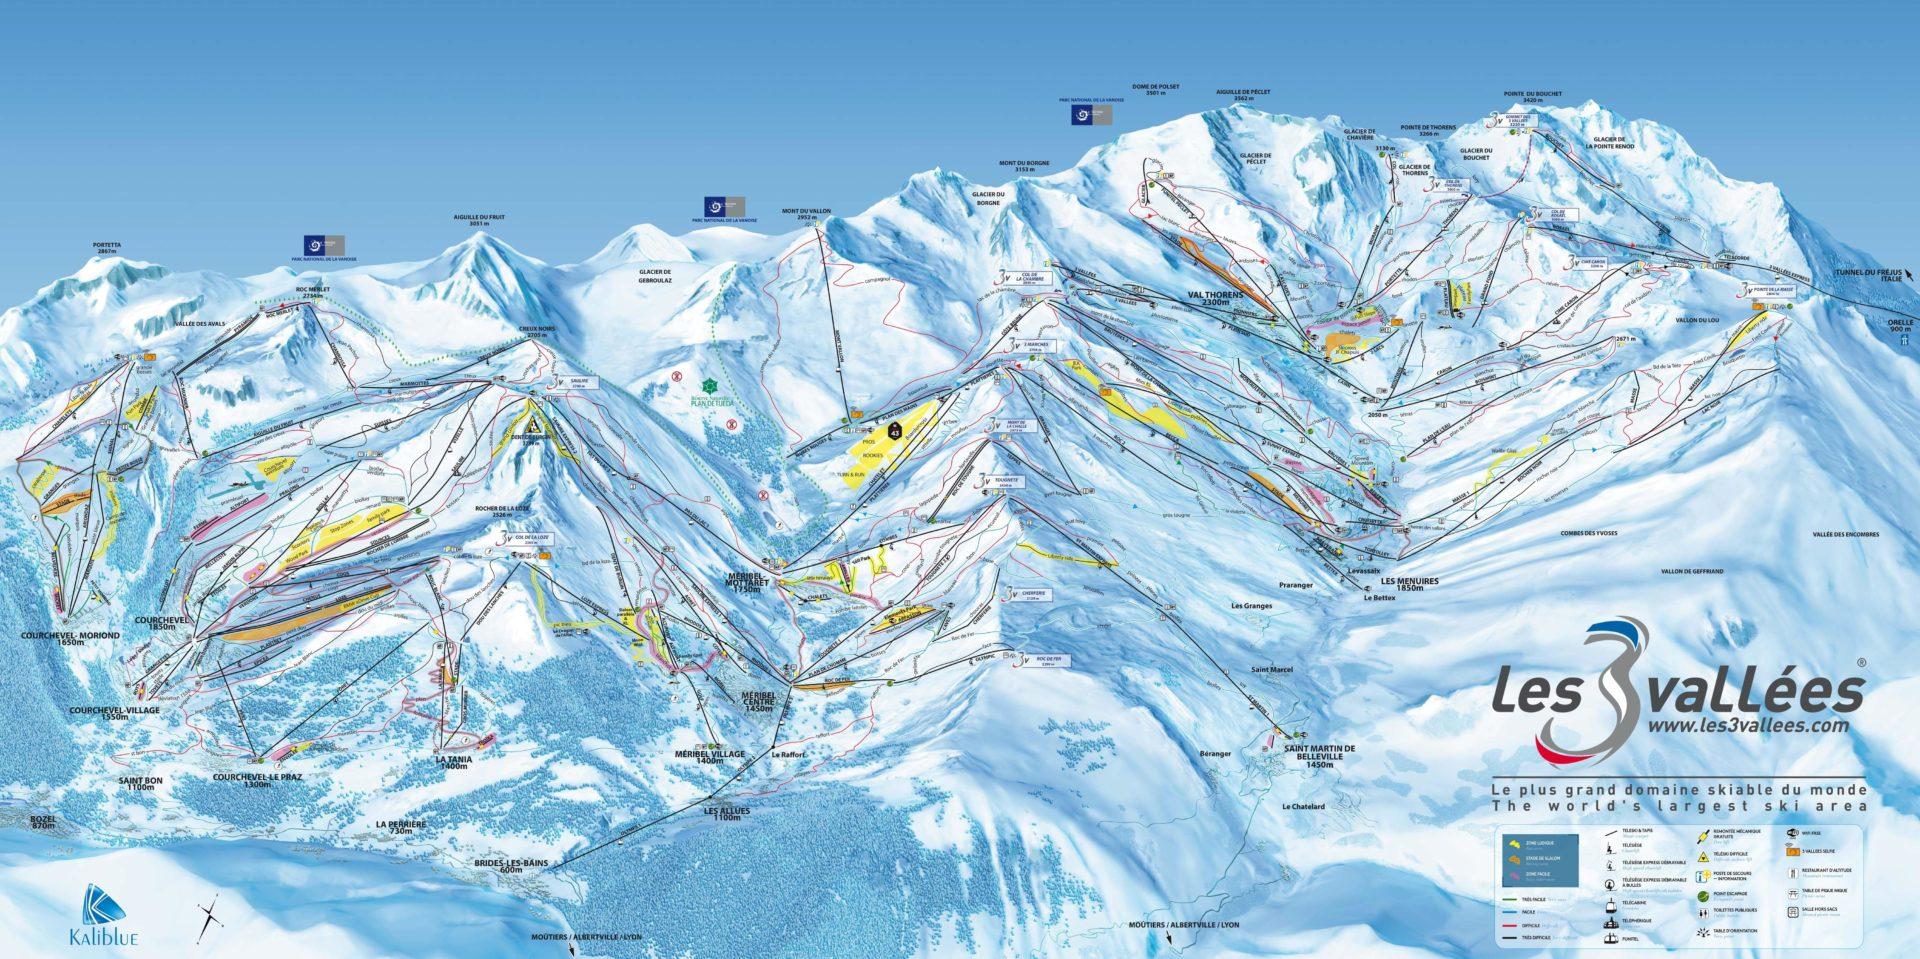 Pisteplattegrond Les 3 Vallees Frankrijk Courchevel La Tania Meribel Val Thorens Les Menuires Saint Martin de Belleville tekening plattegrond skigebied pistes wintersport skivakantie luxe